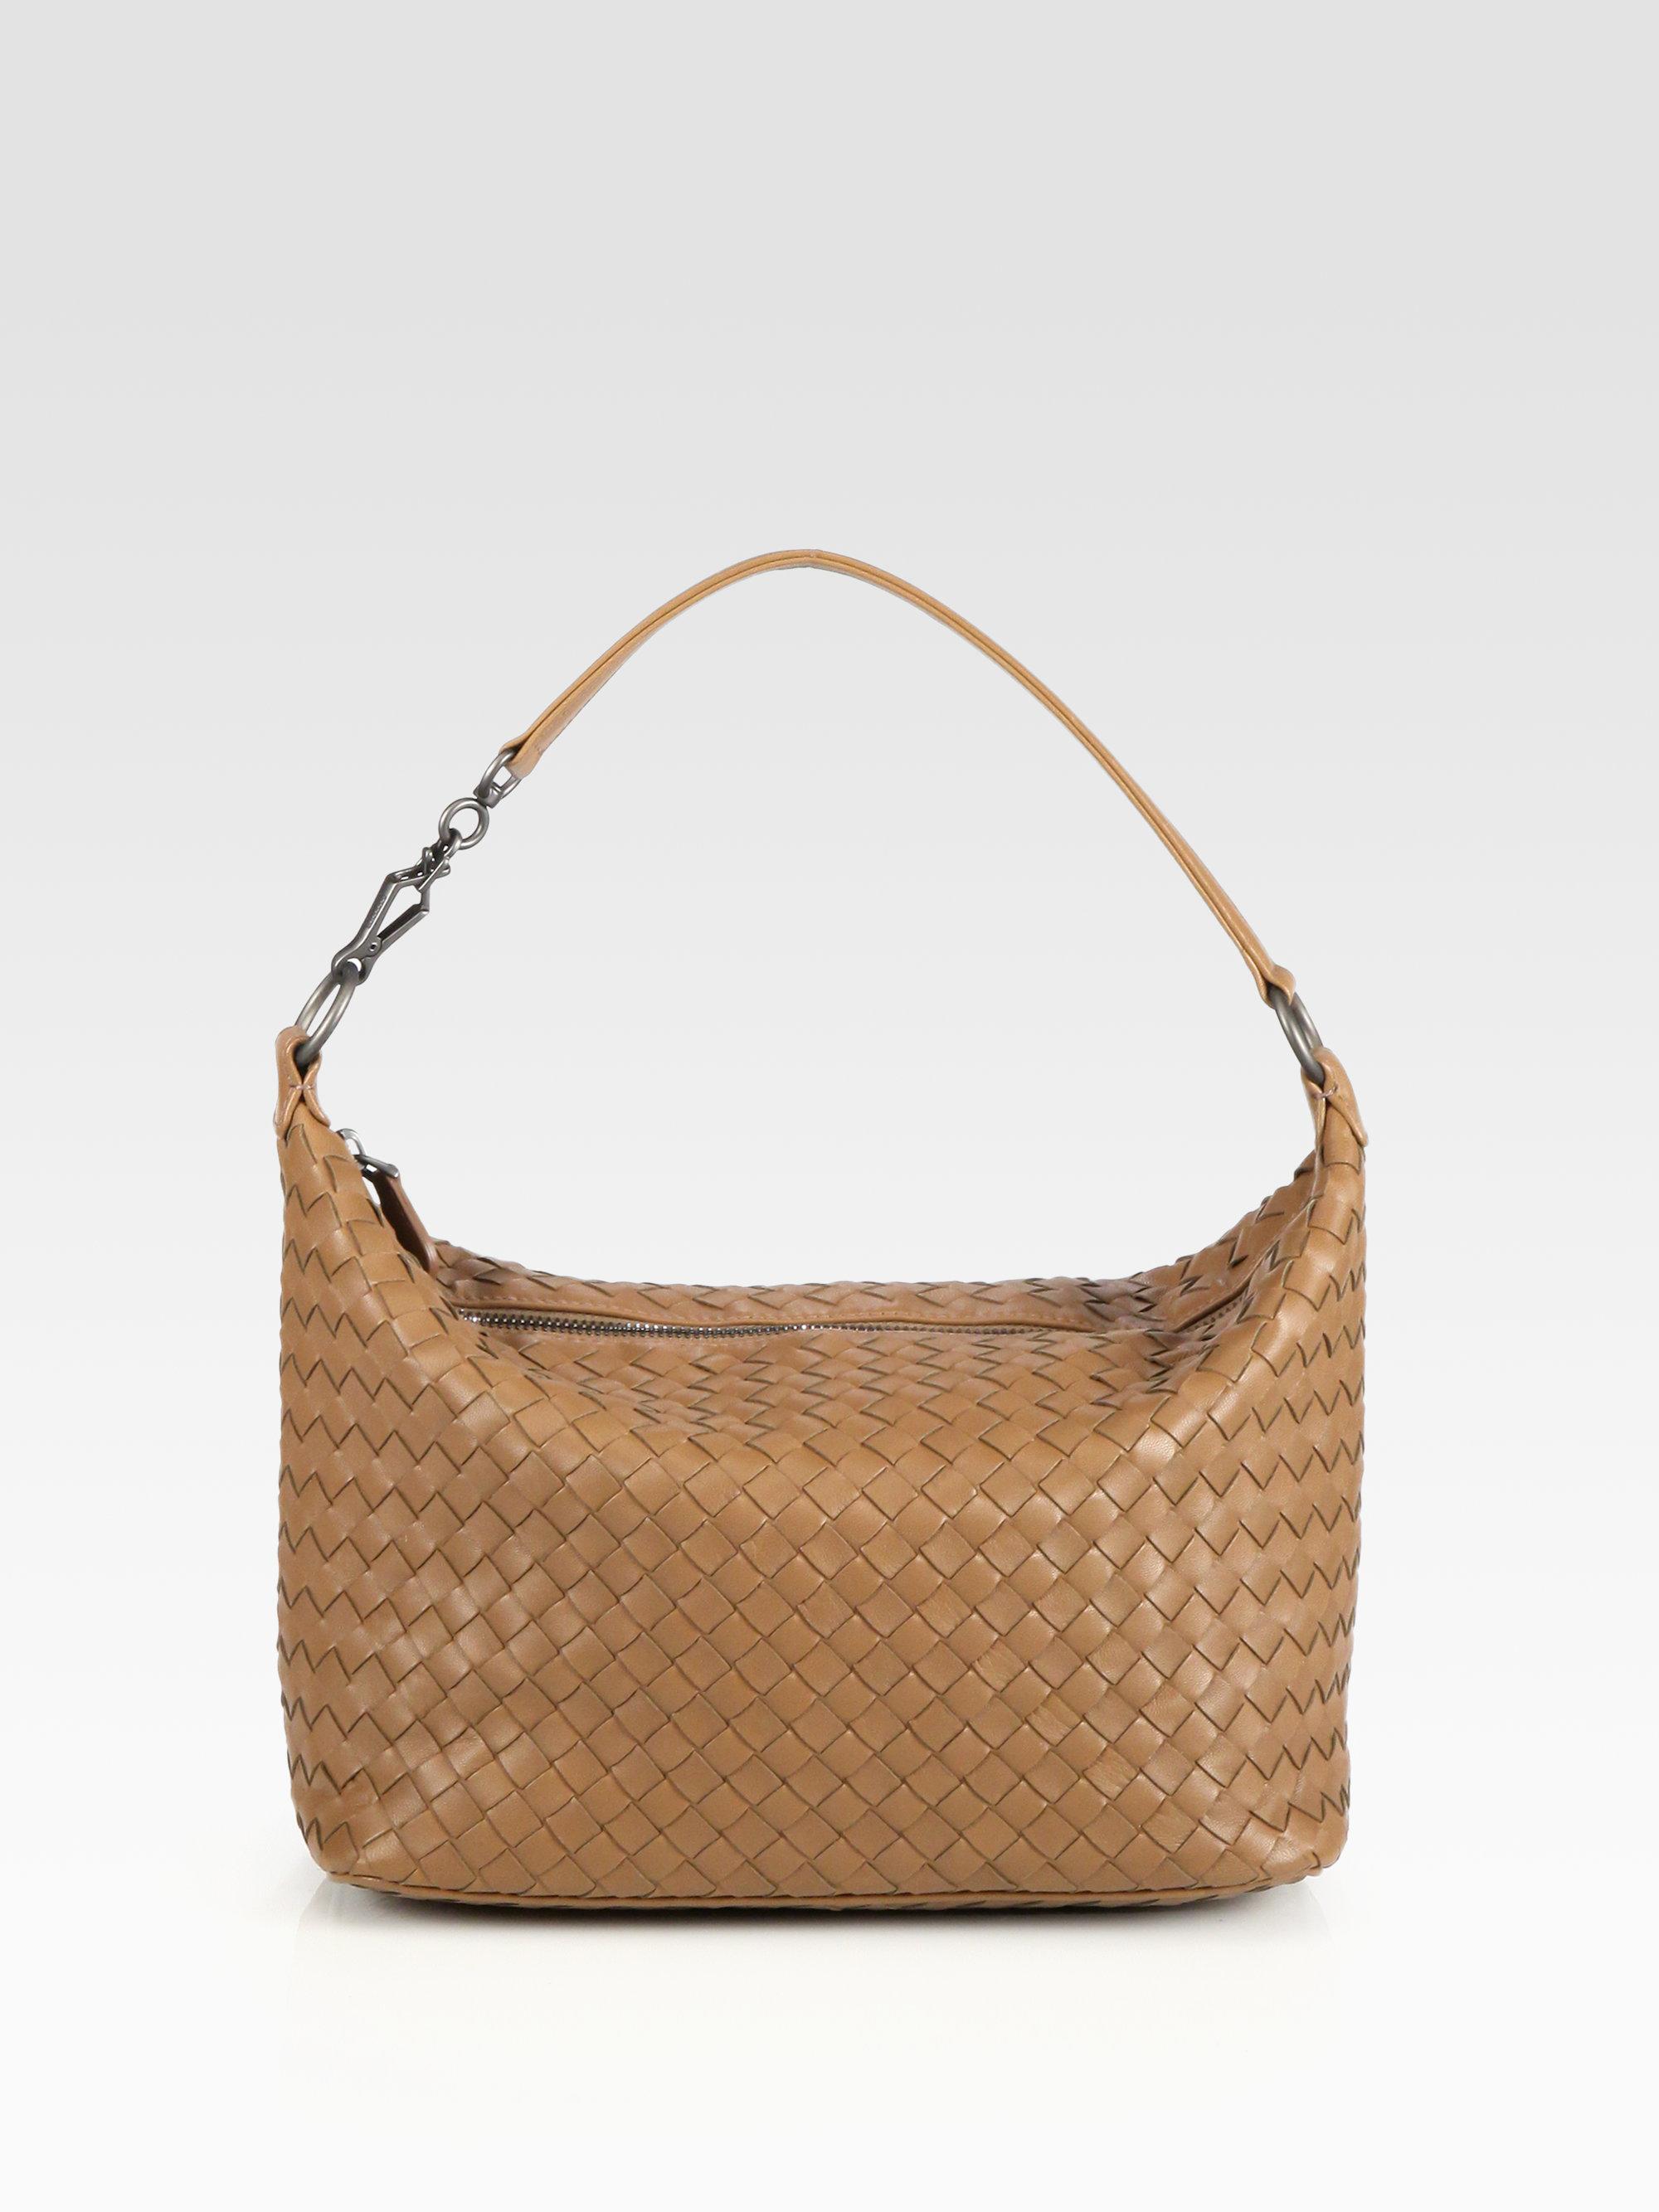 Bottega Veneta Woven Leather Mini Shoulder Bag 70